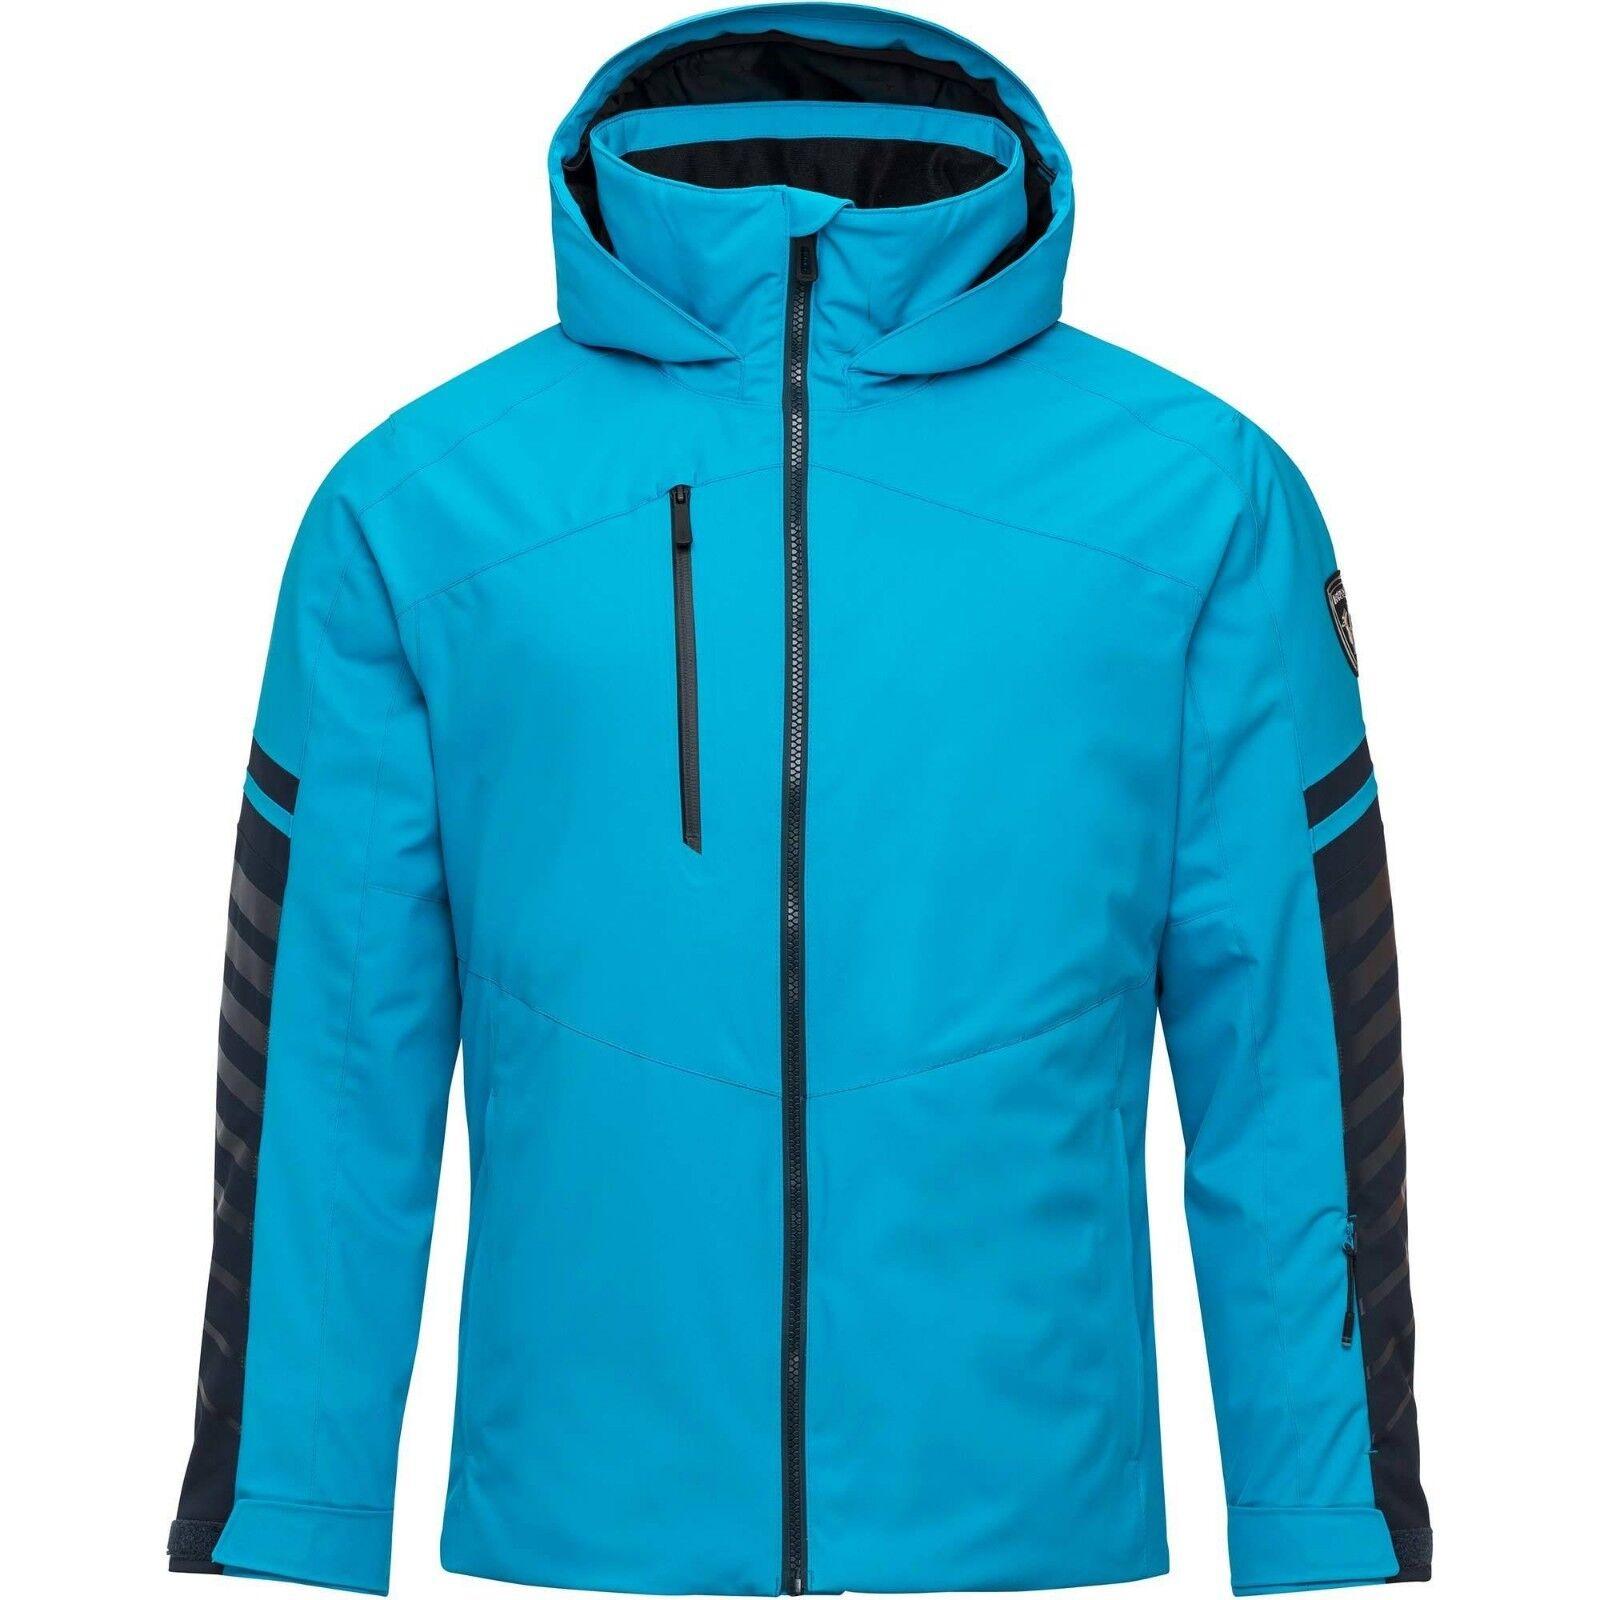 Rossignol Fonction Jacket Men Skijacke Herren Ski Jacke RLHMJ30 blue jay blau